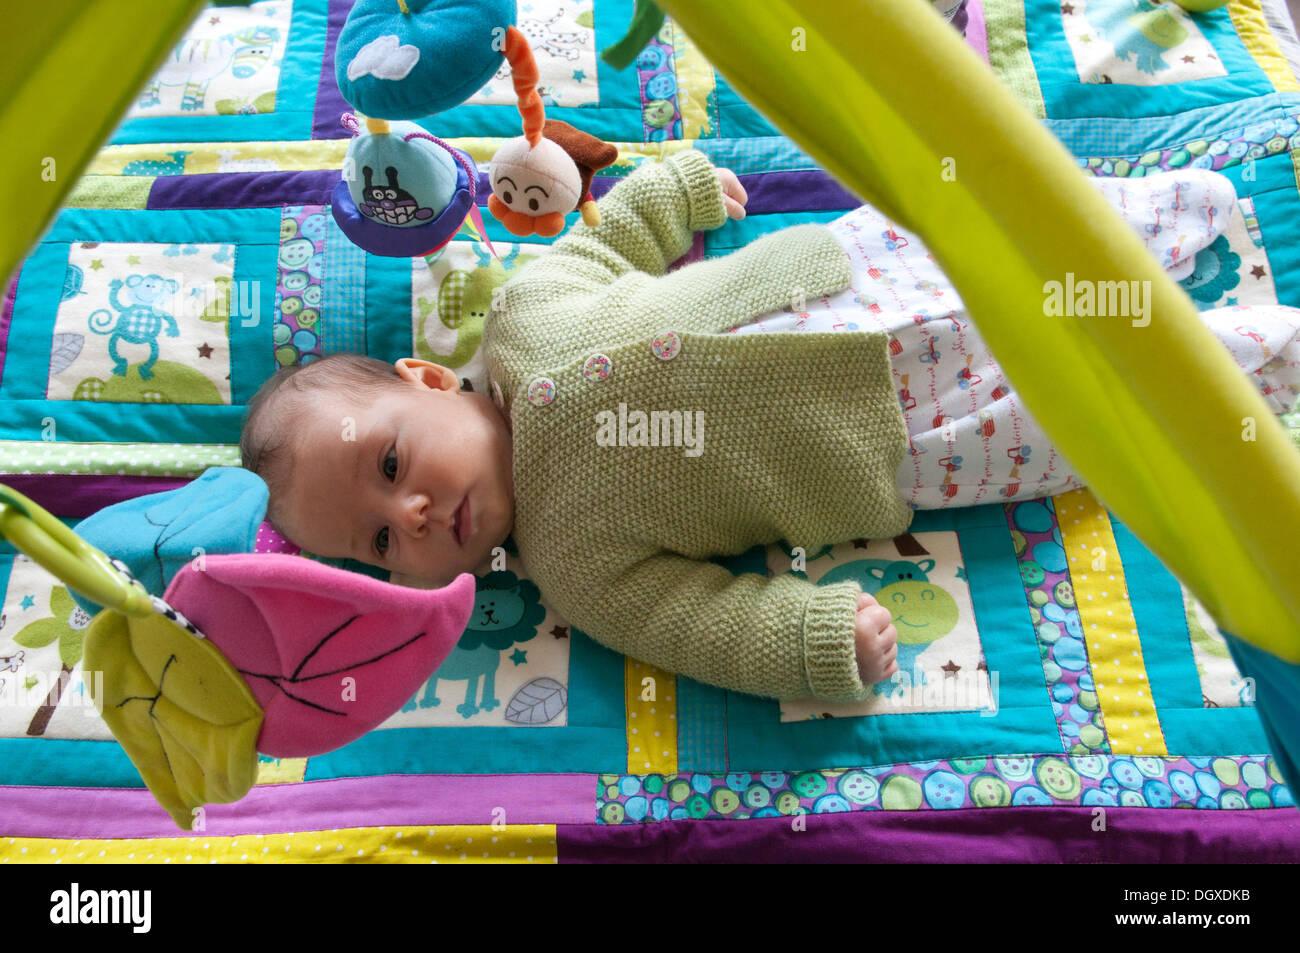 Patchwork Hanging Stockfotos & Patchwork Hanging Bilder - Alamy